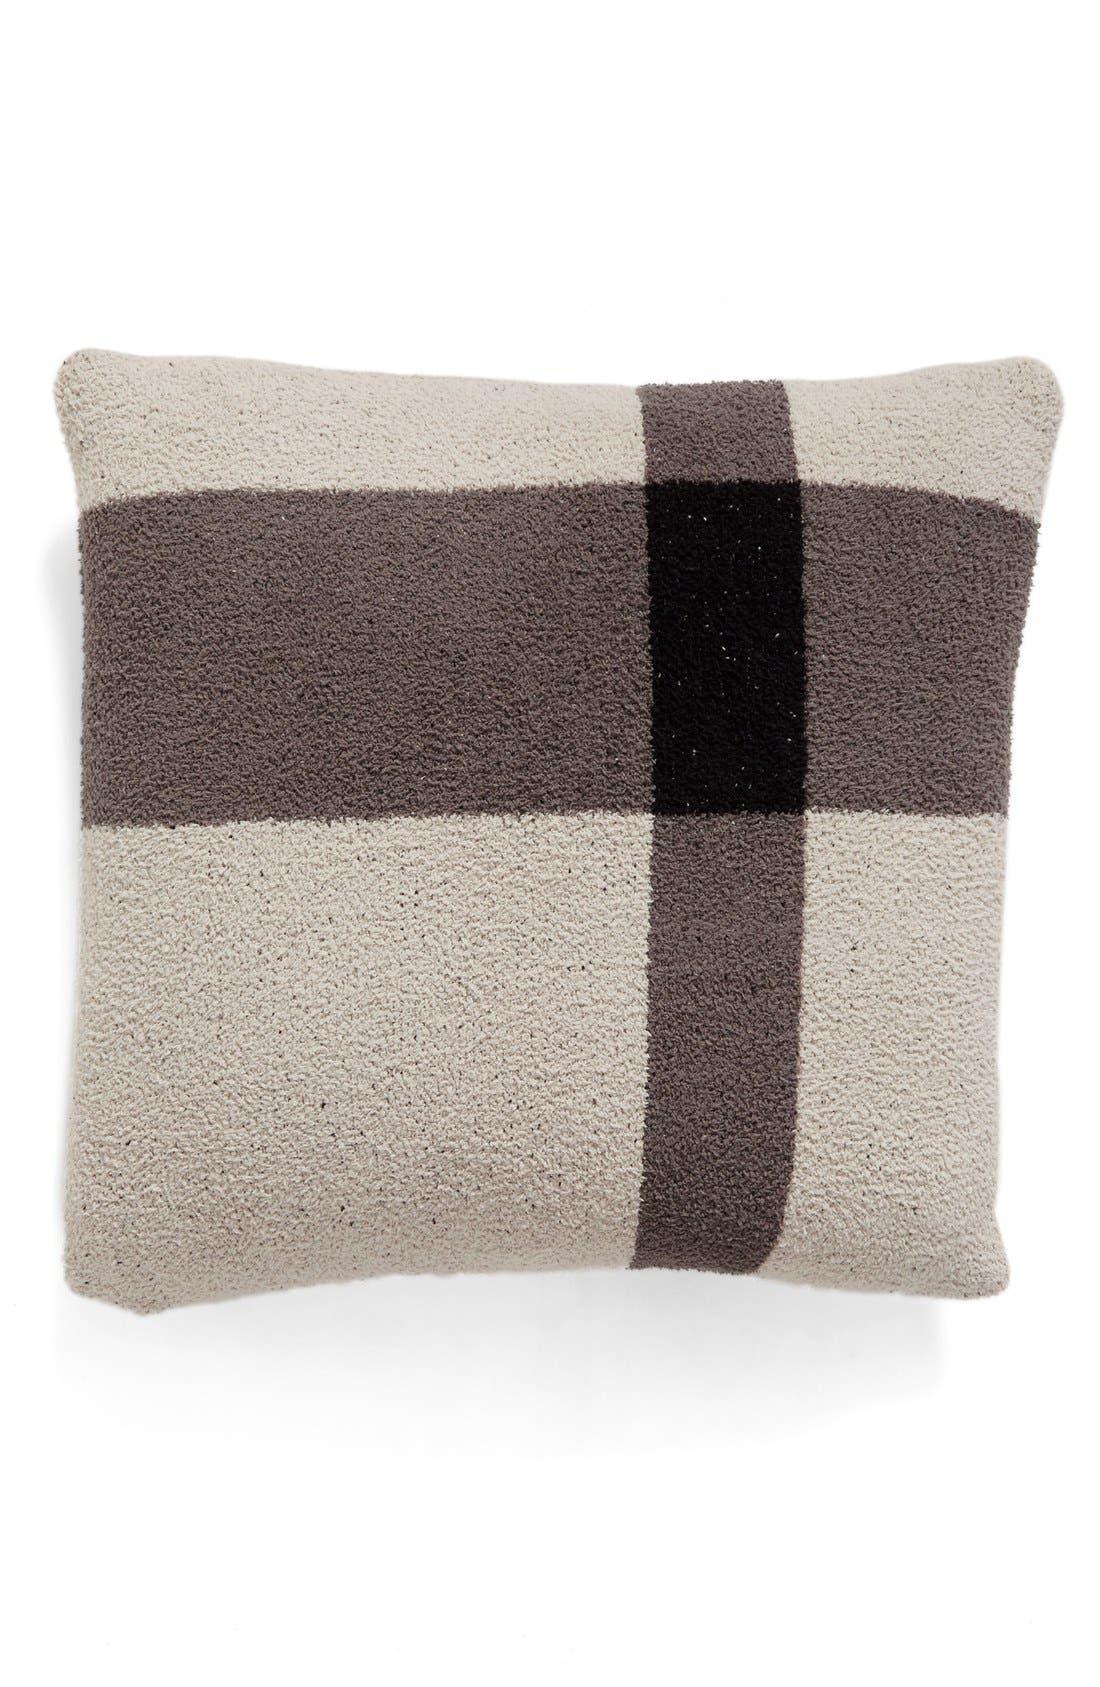 Barefoot Dreams® CozyChic® Plaid Accent Pillow